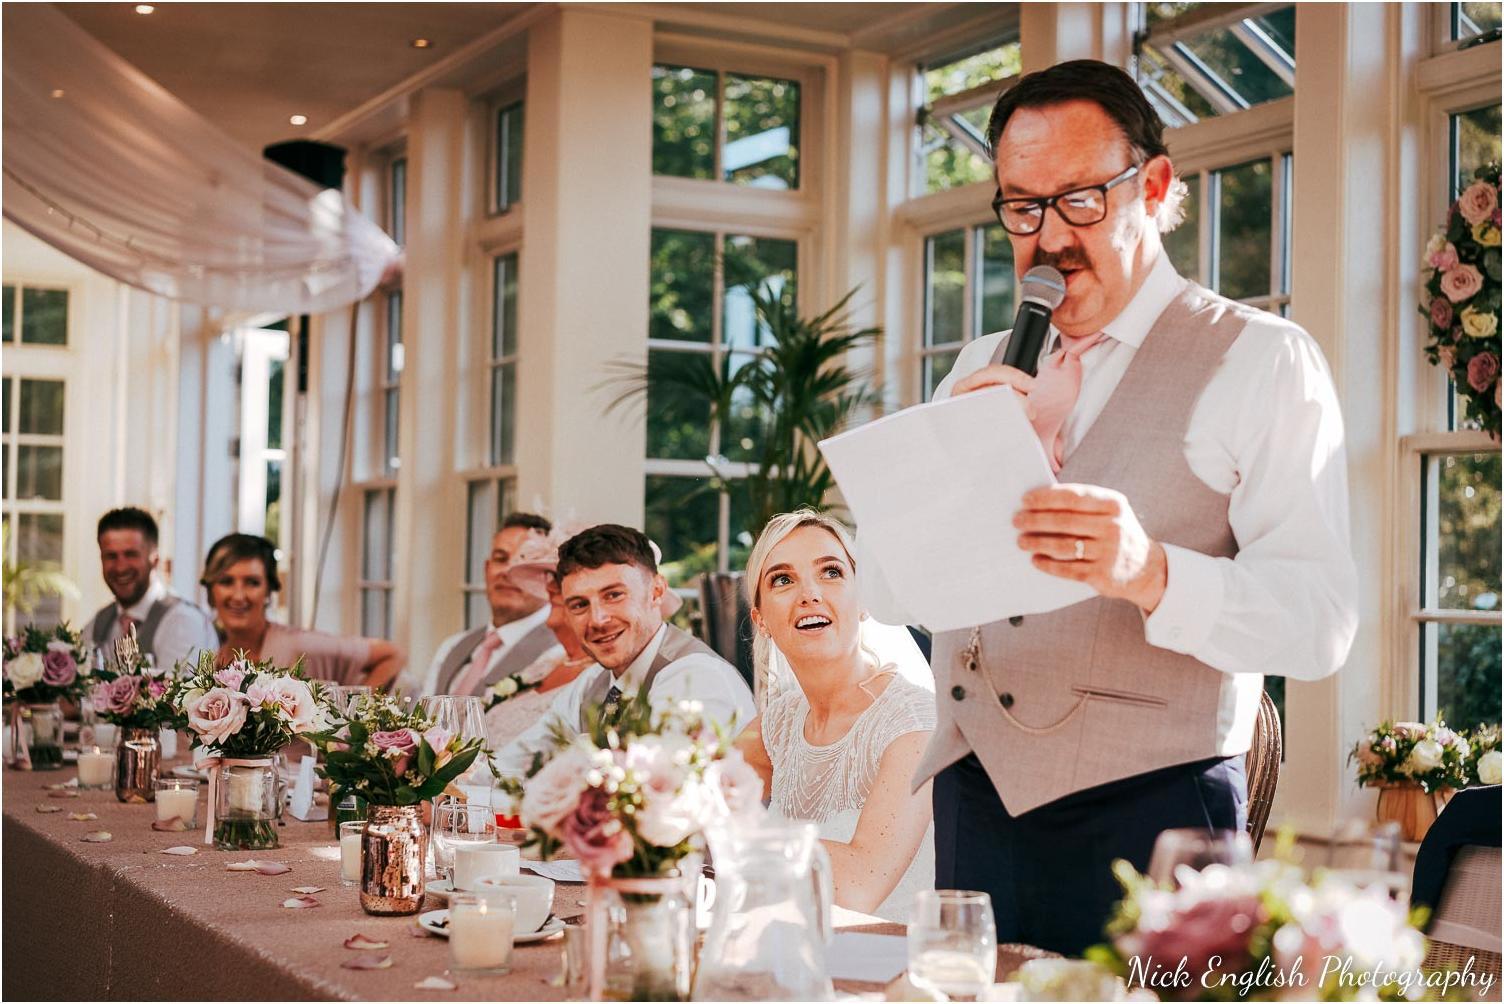 Mitton_Hall_Wedding_Photograph-147.jpg